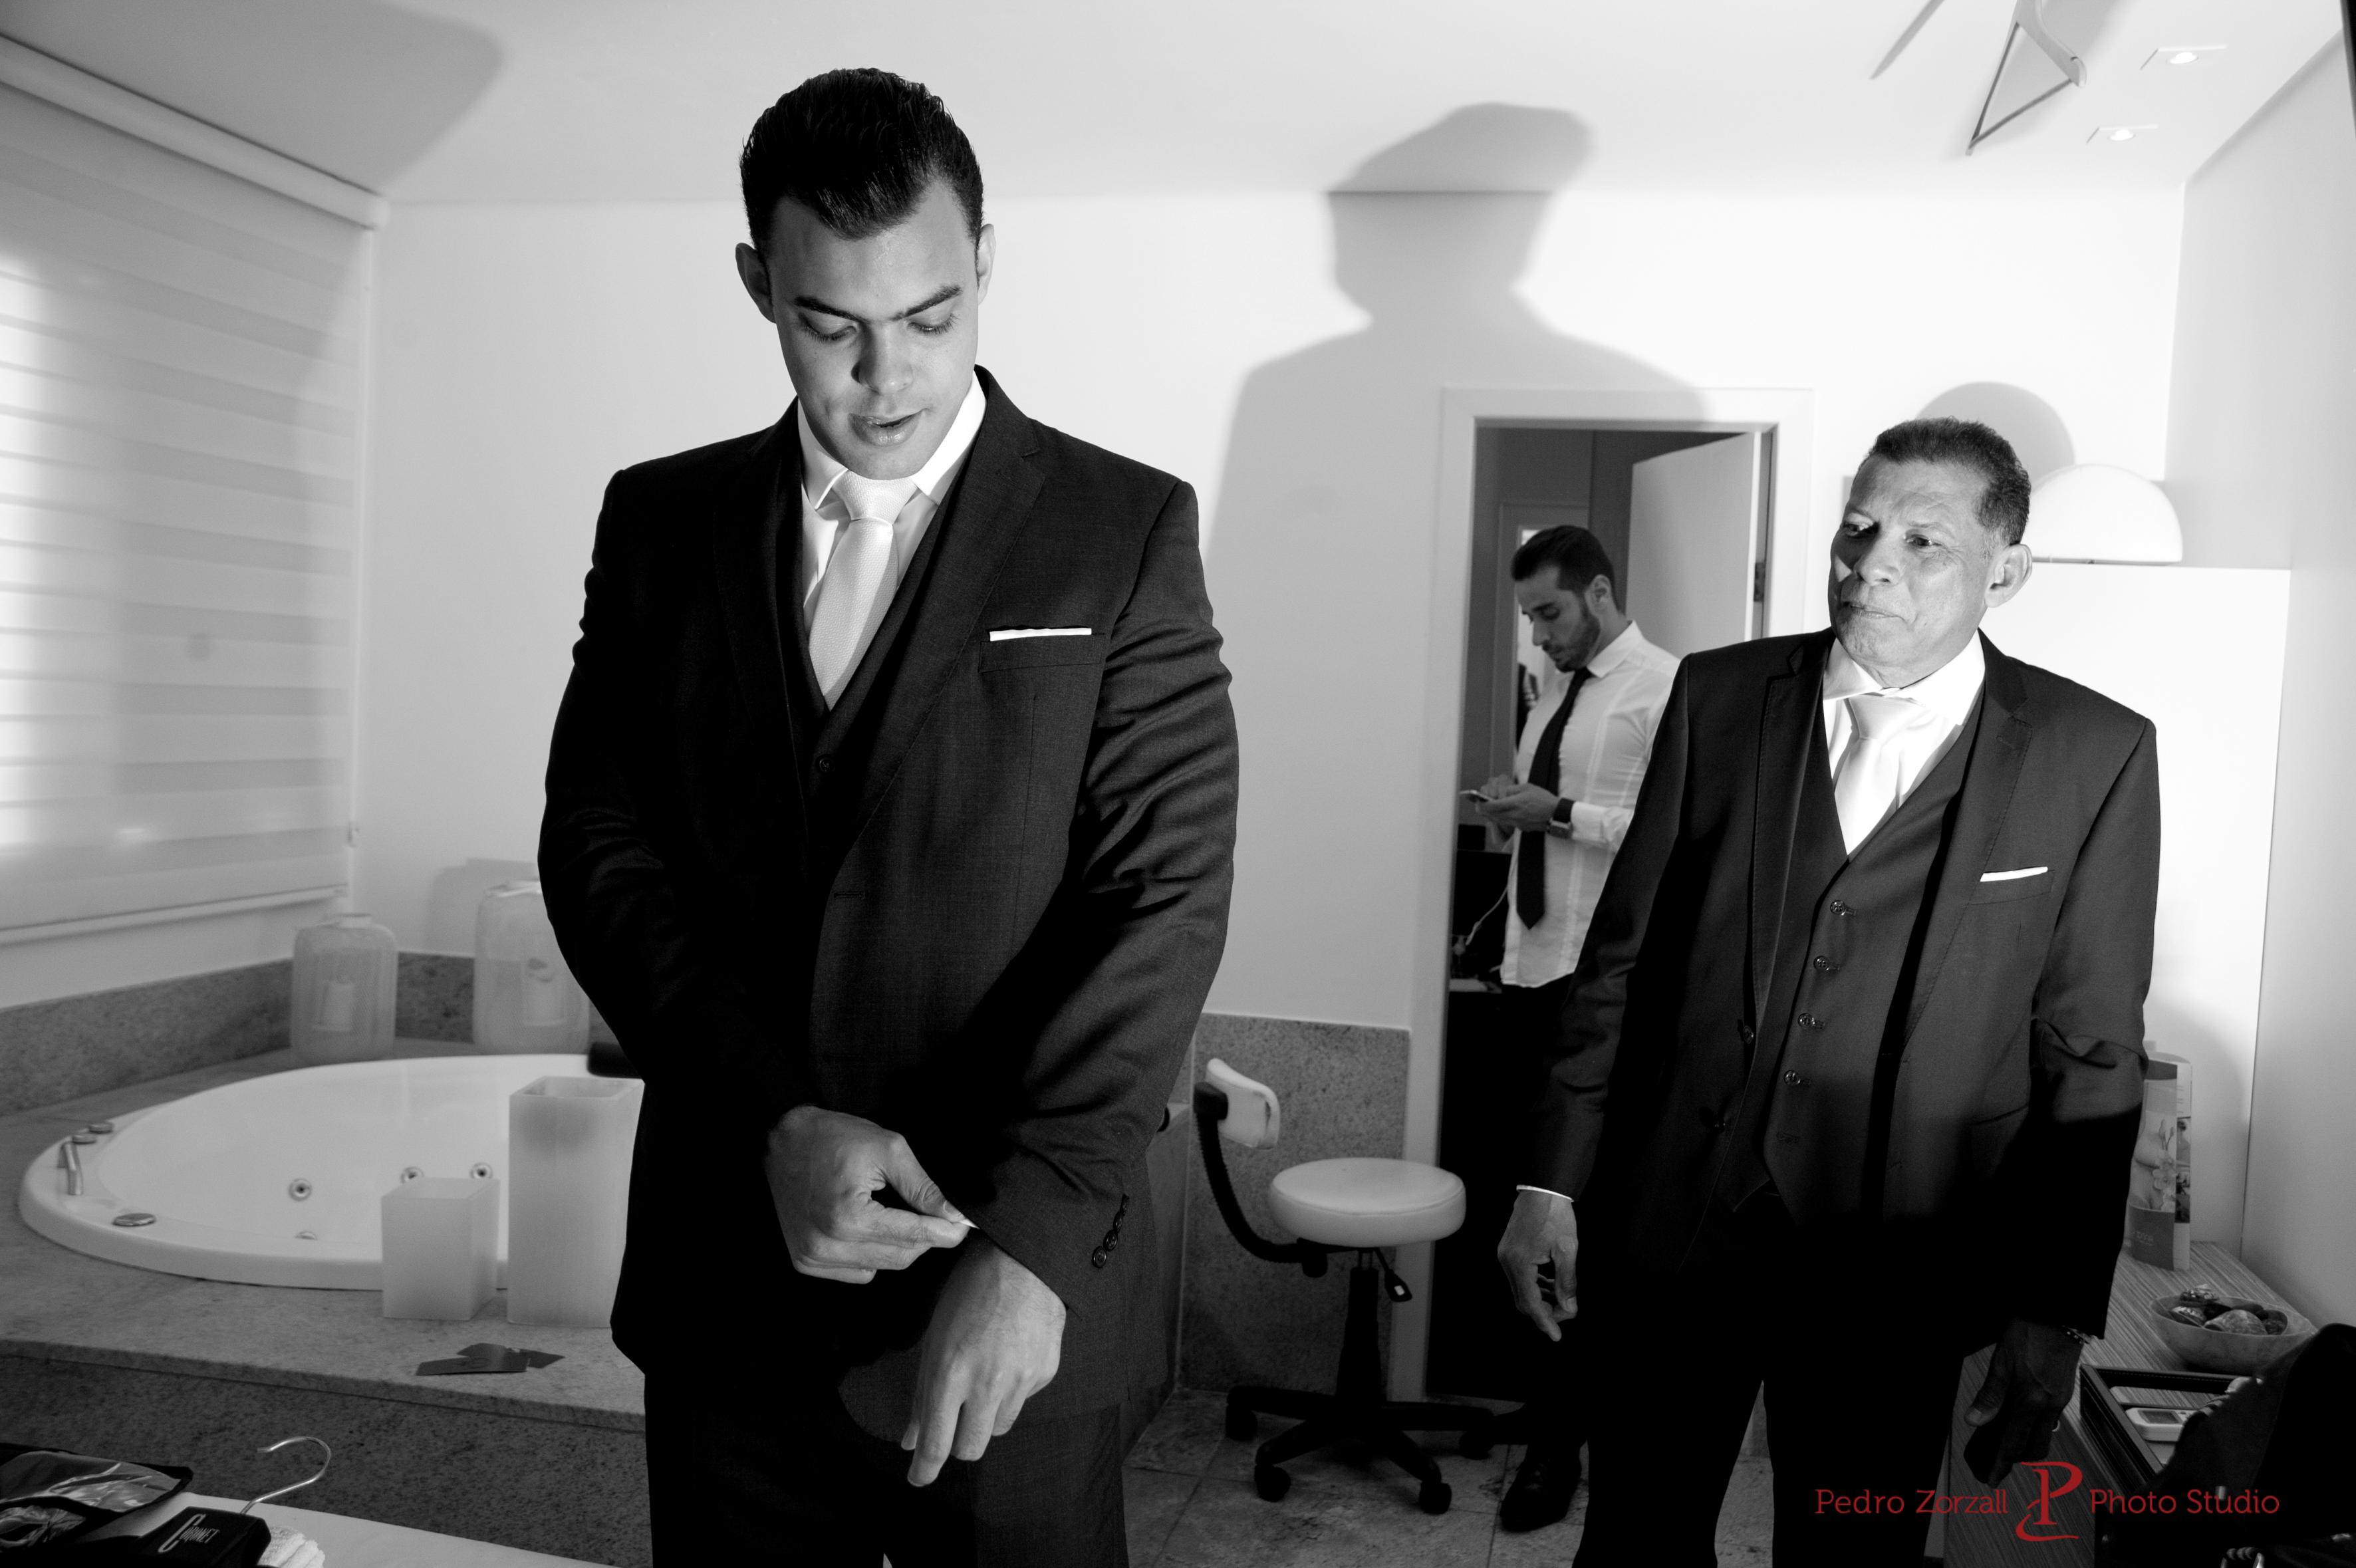 59fotografo Pedro Zorzall- fotografia de